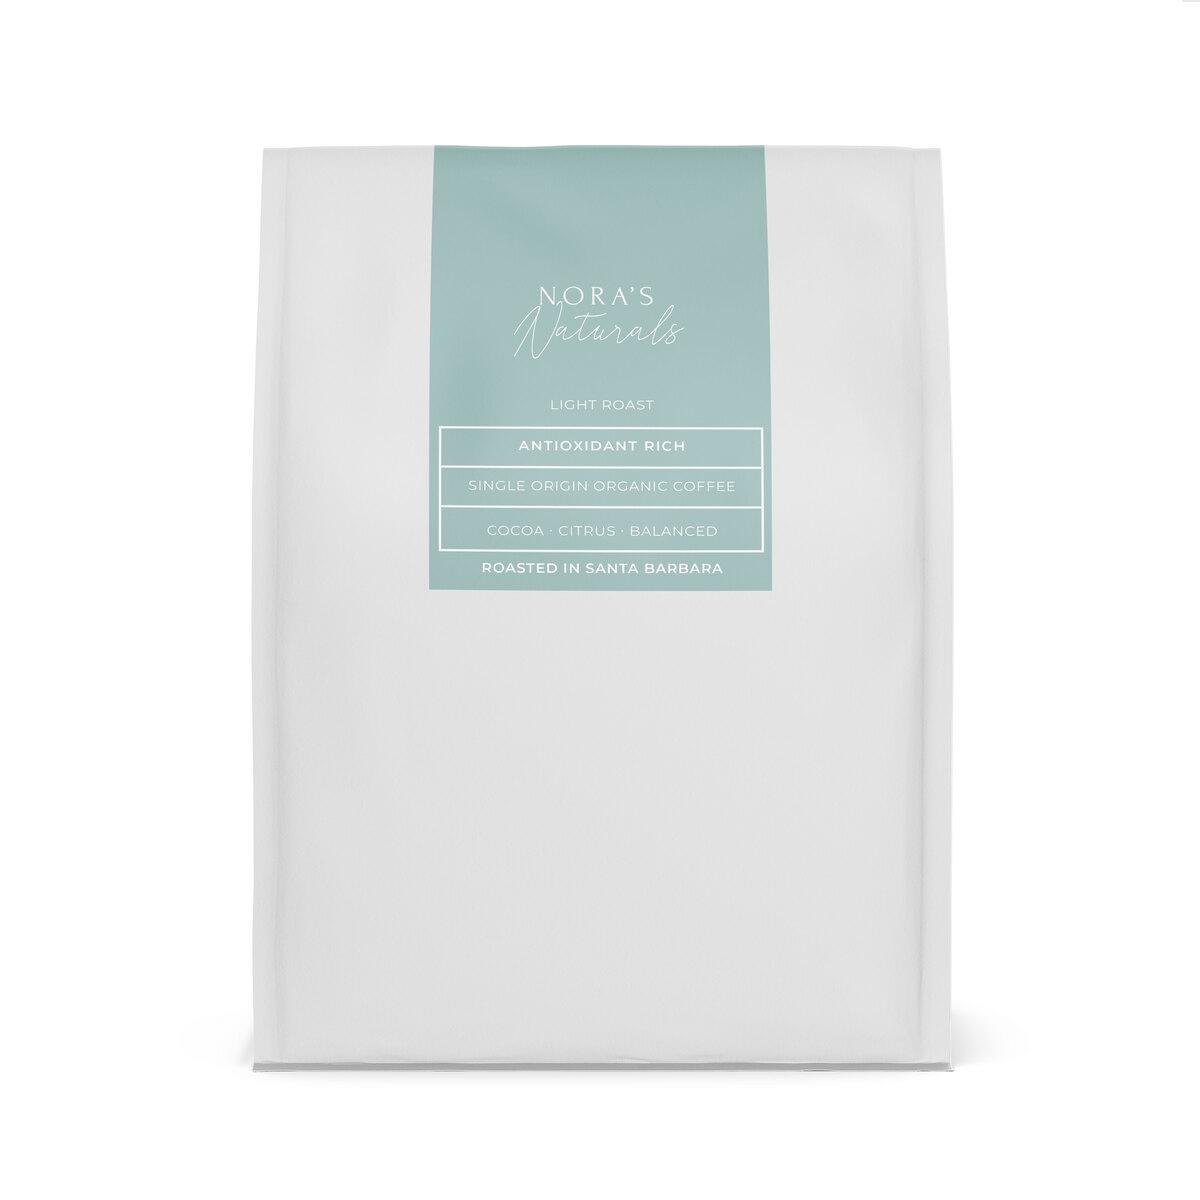 Nora's Naturals Coffee